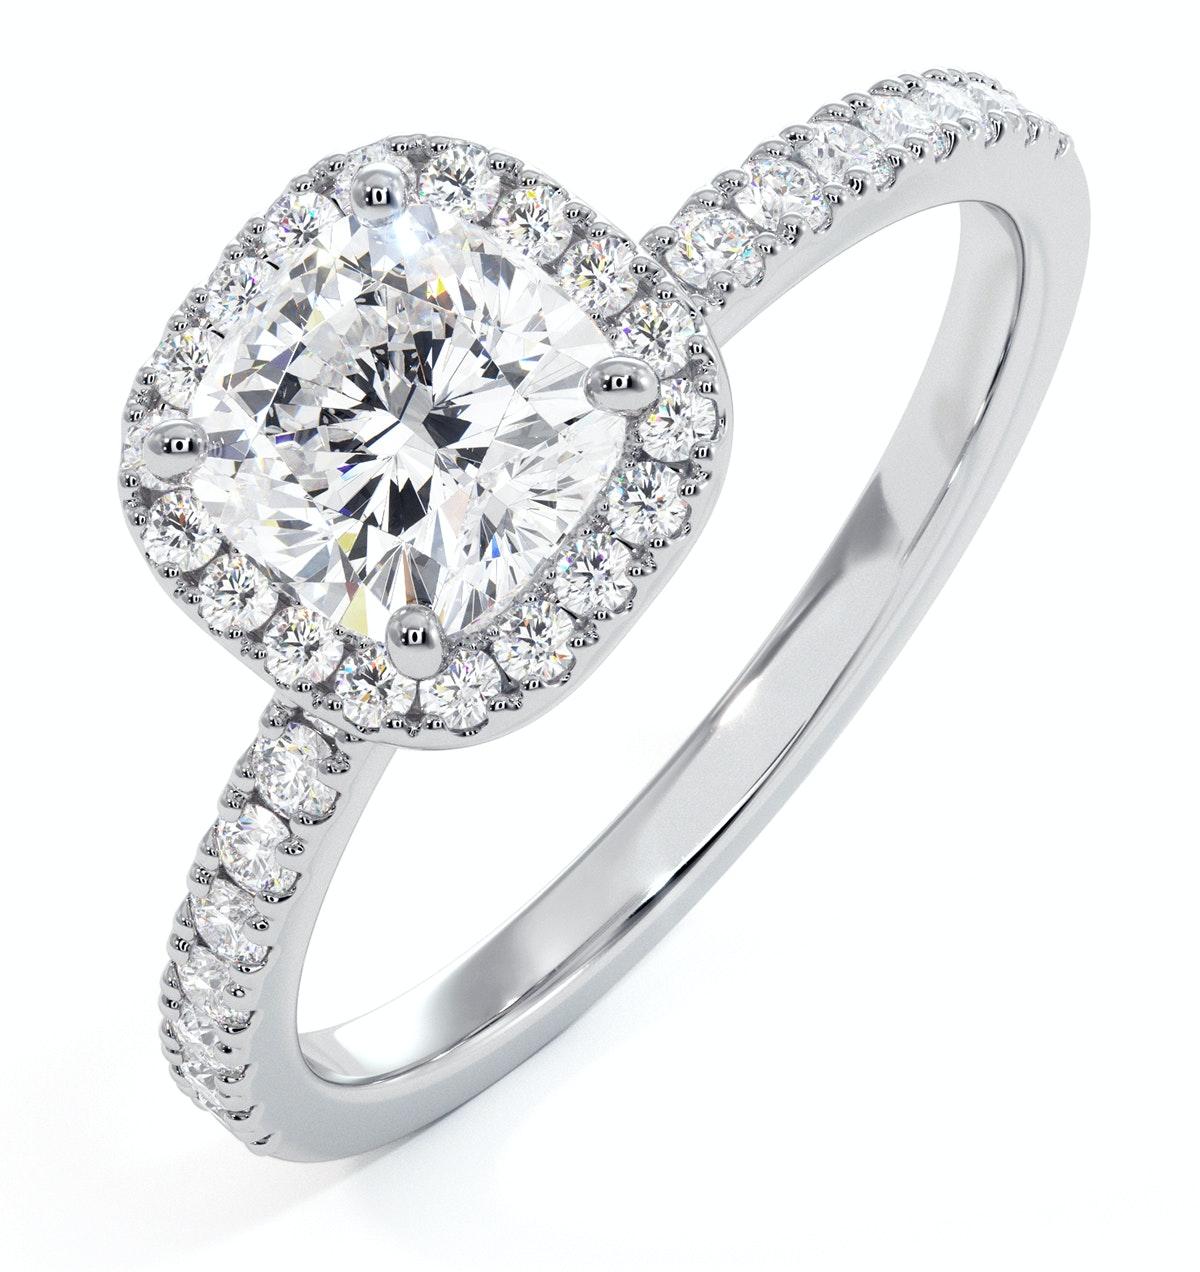 Beatrice GIA Diamond Halo Engagement Ring in Platinum 1.48ct G/SI2